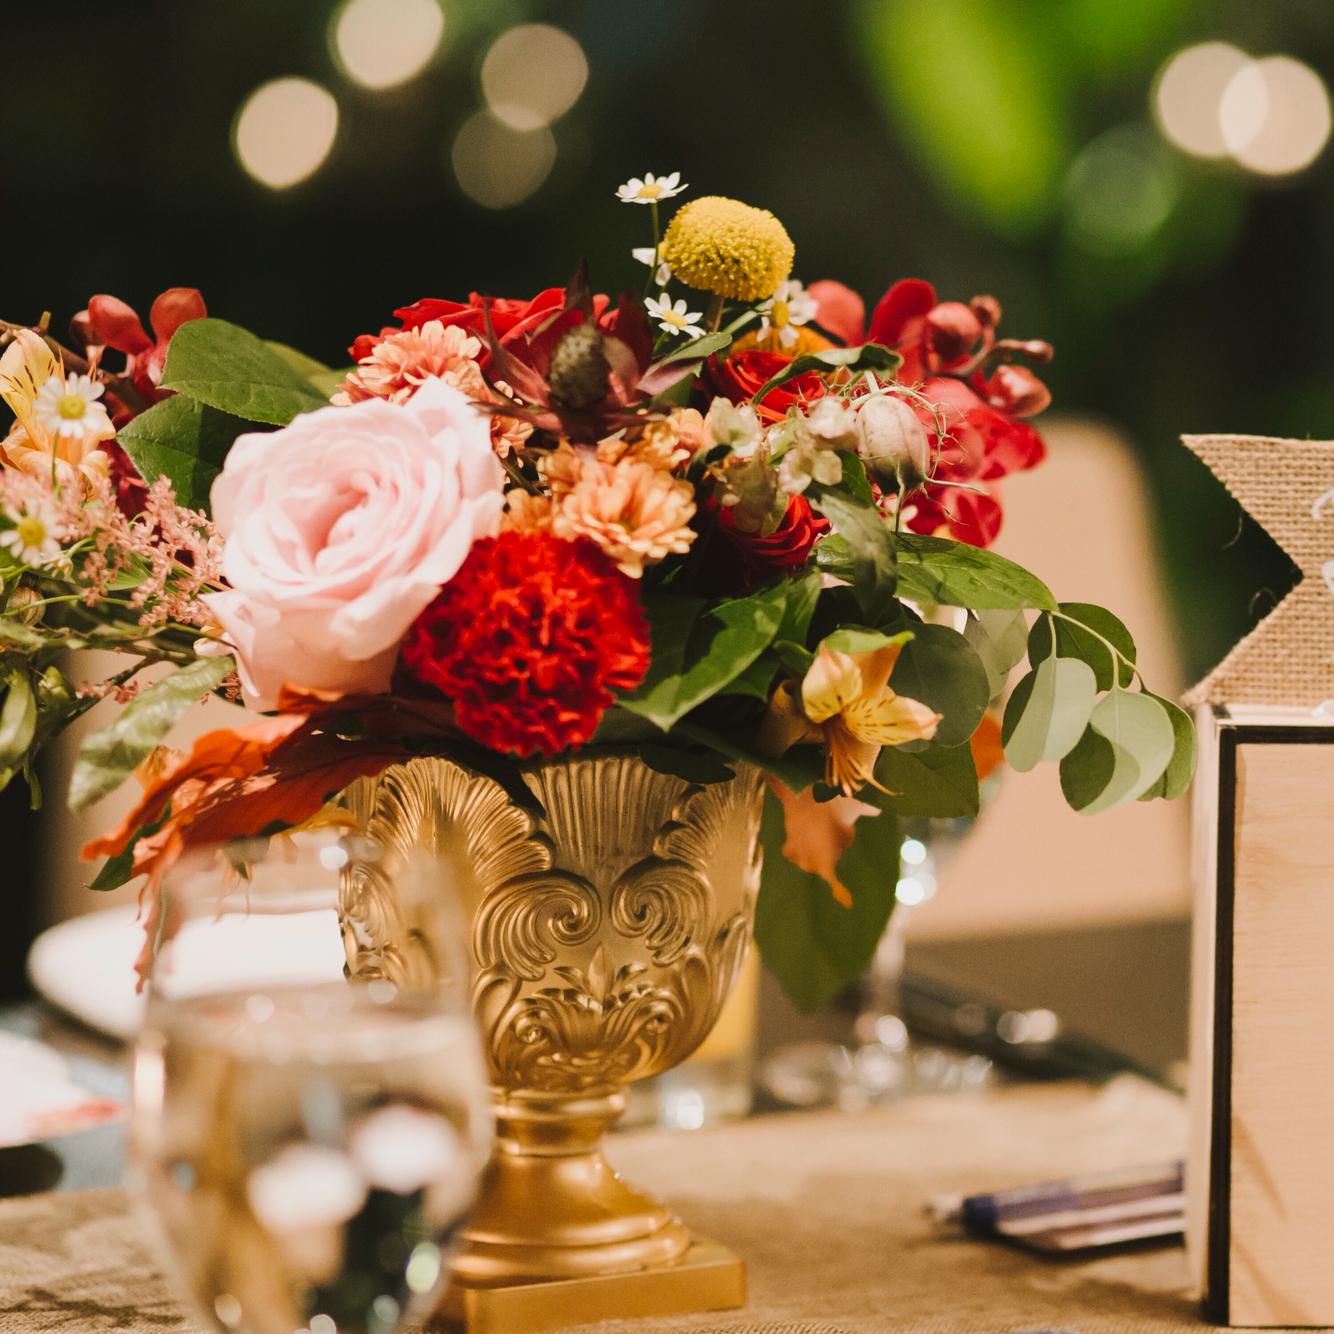 Tempat Jual Sepatu Boot Pria Rc161 Terbaru 2018 Artech Ar100 Phone Ampamp Pabx Recording Personal Voice Manager Wedding Vendors Inspirations